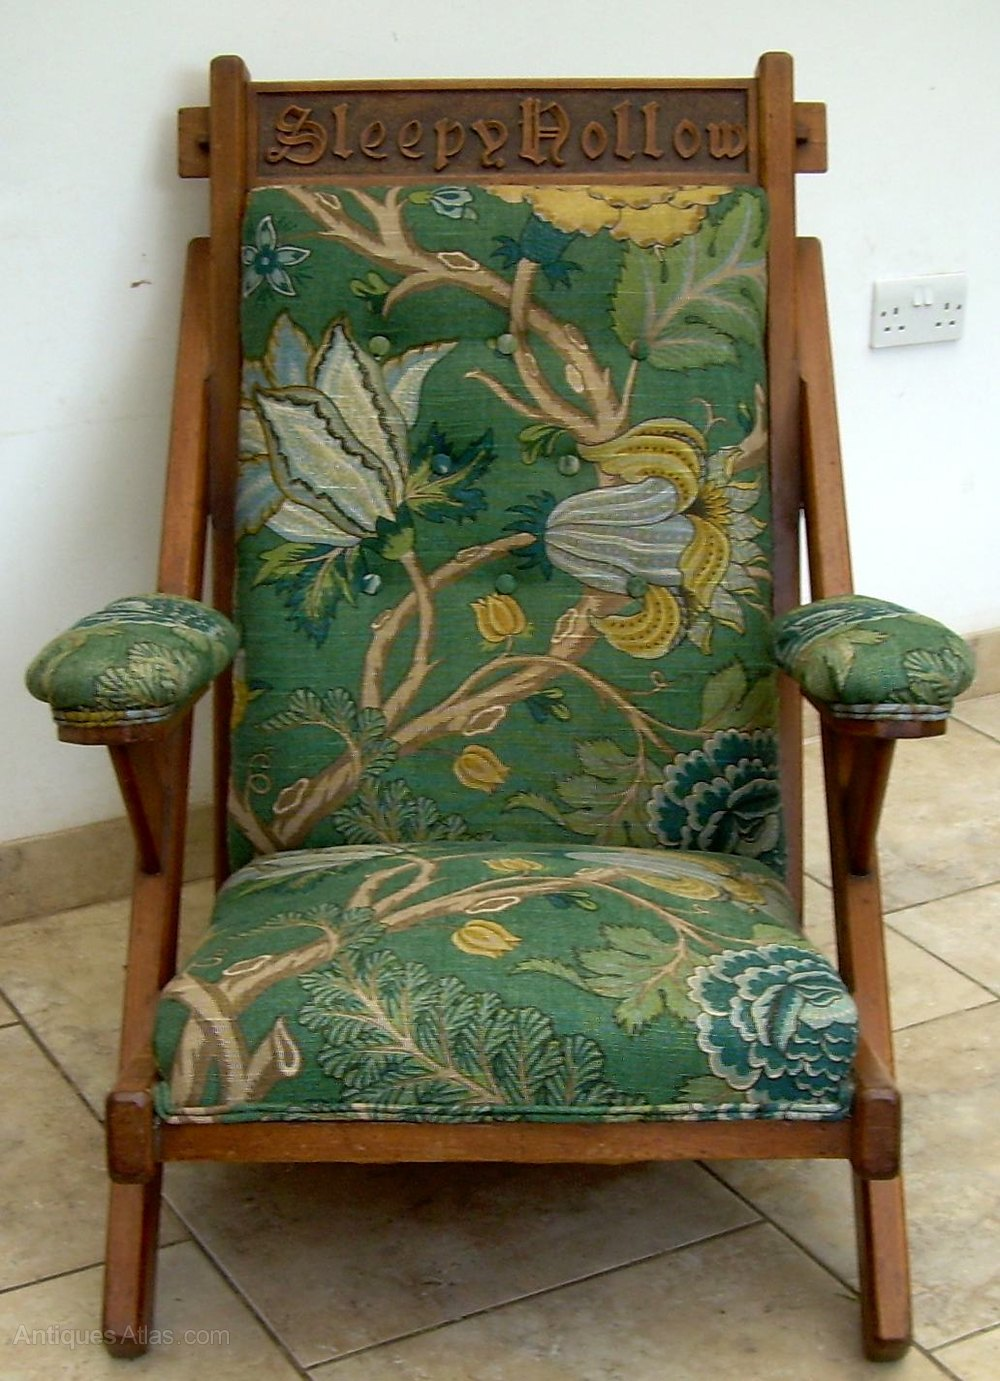 Stock Interiors Com >> An Arts & Crafts Armchair - Antiques Atlas